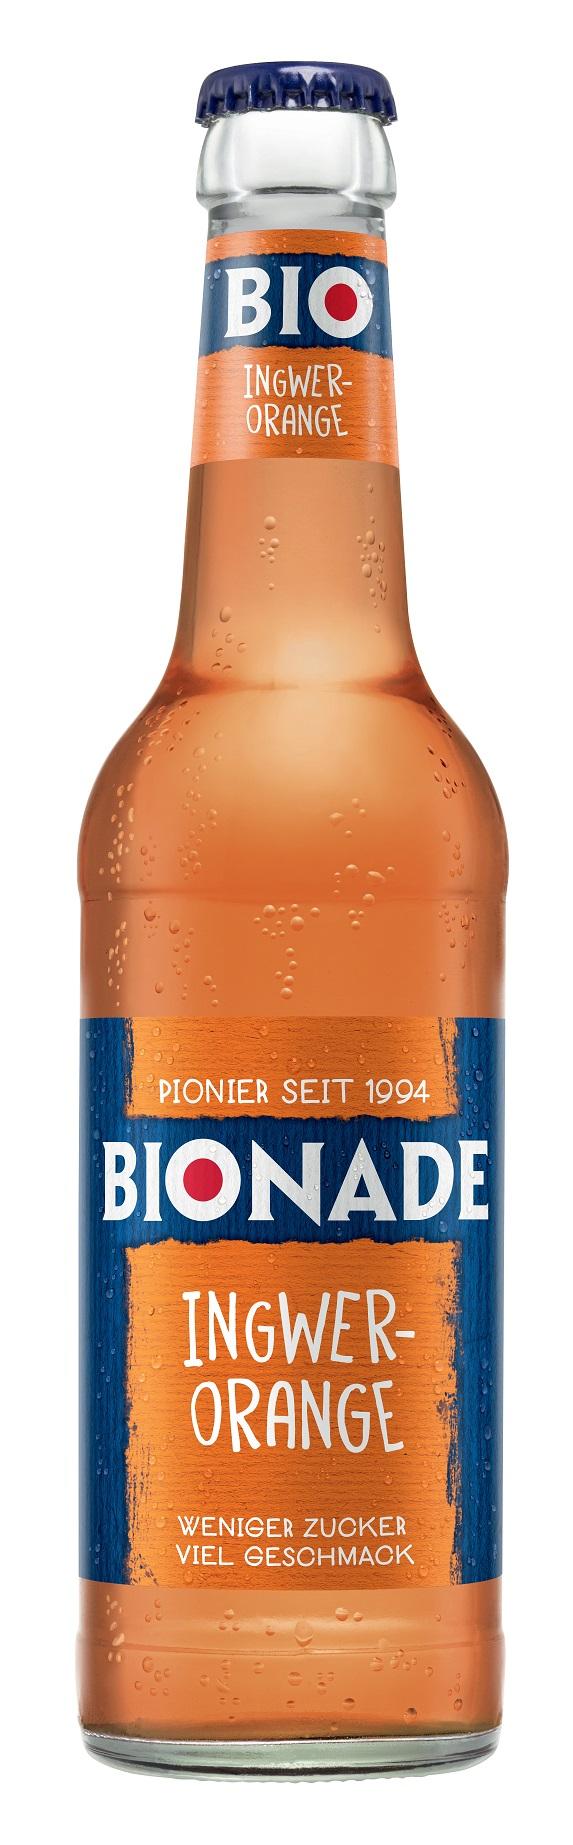 Bionade Ingwer-Orange